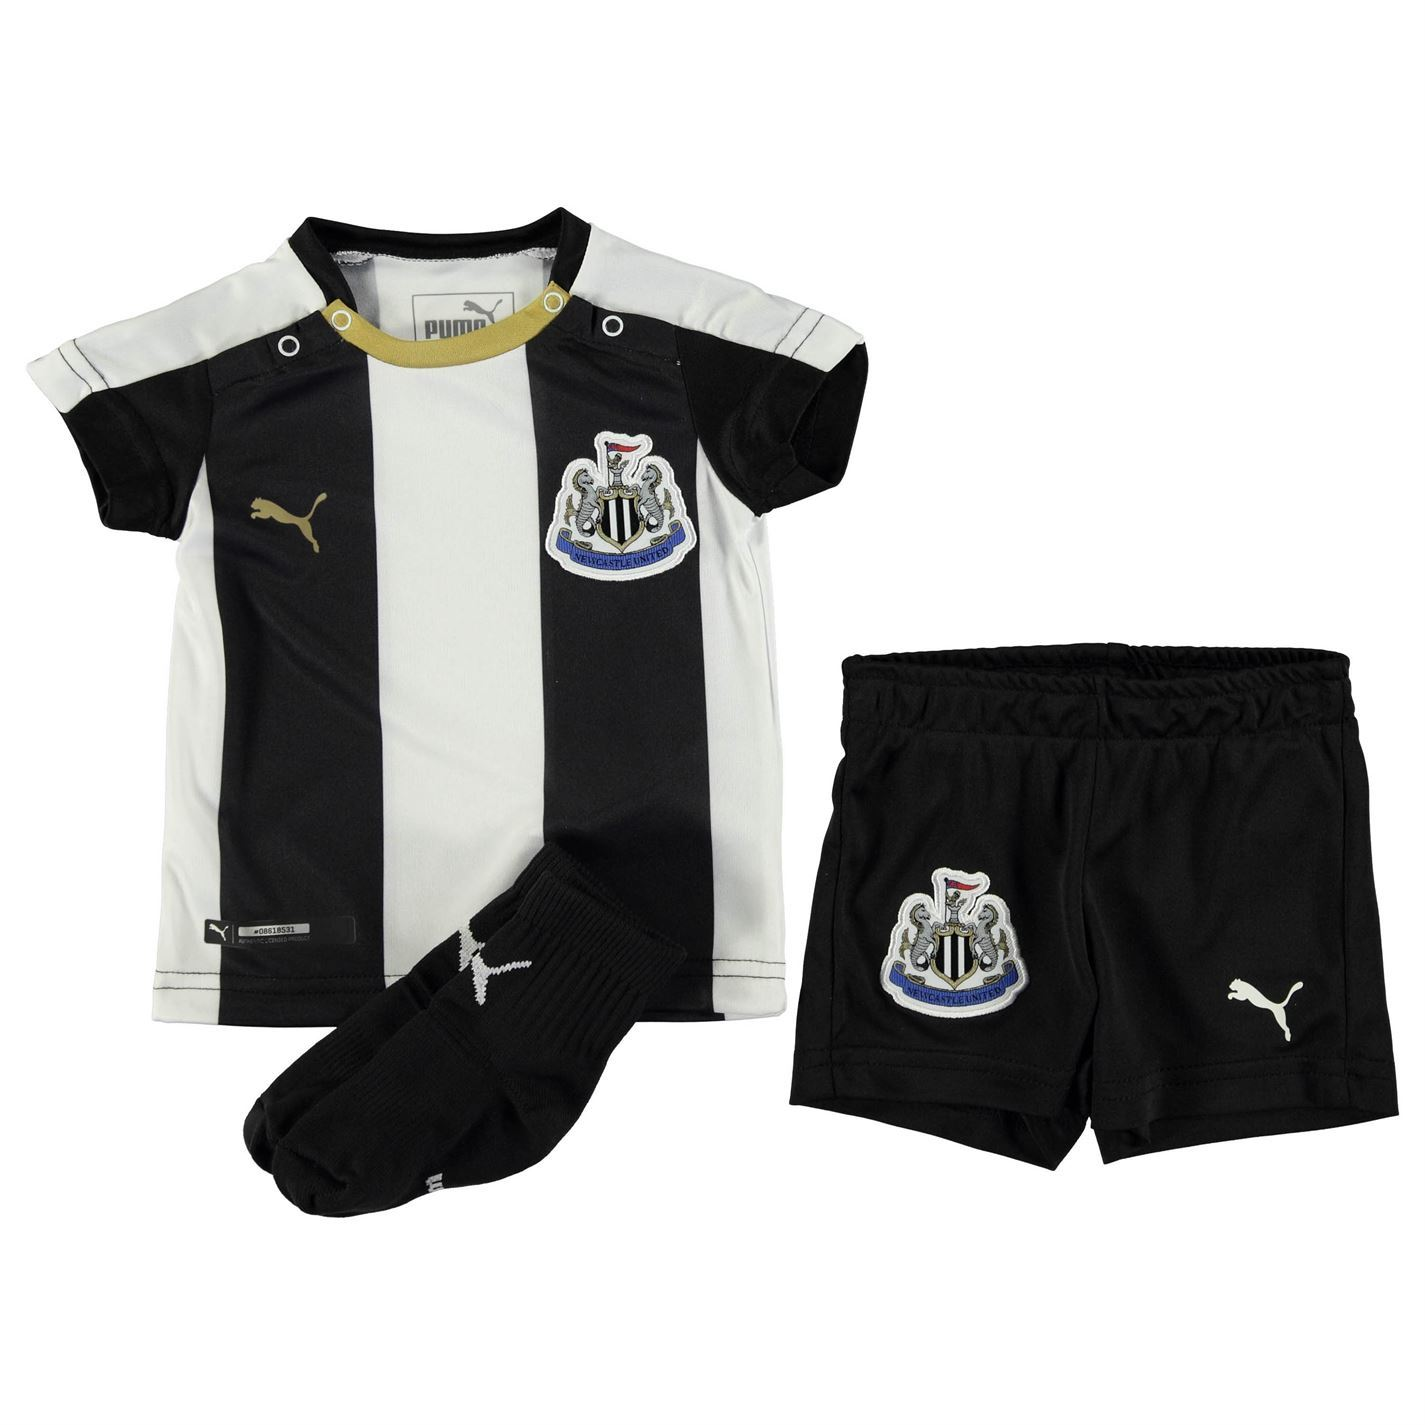 Puma Newcastle United Home Kit 2016 2017 Infants Football ...